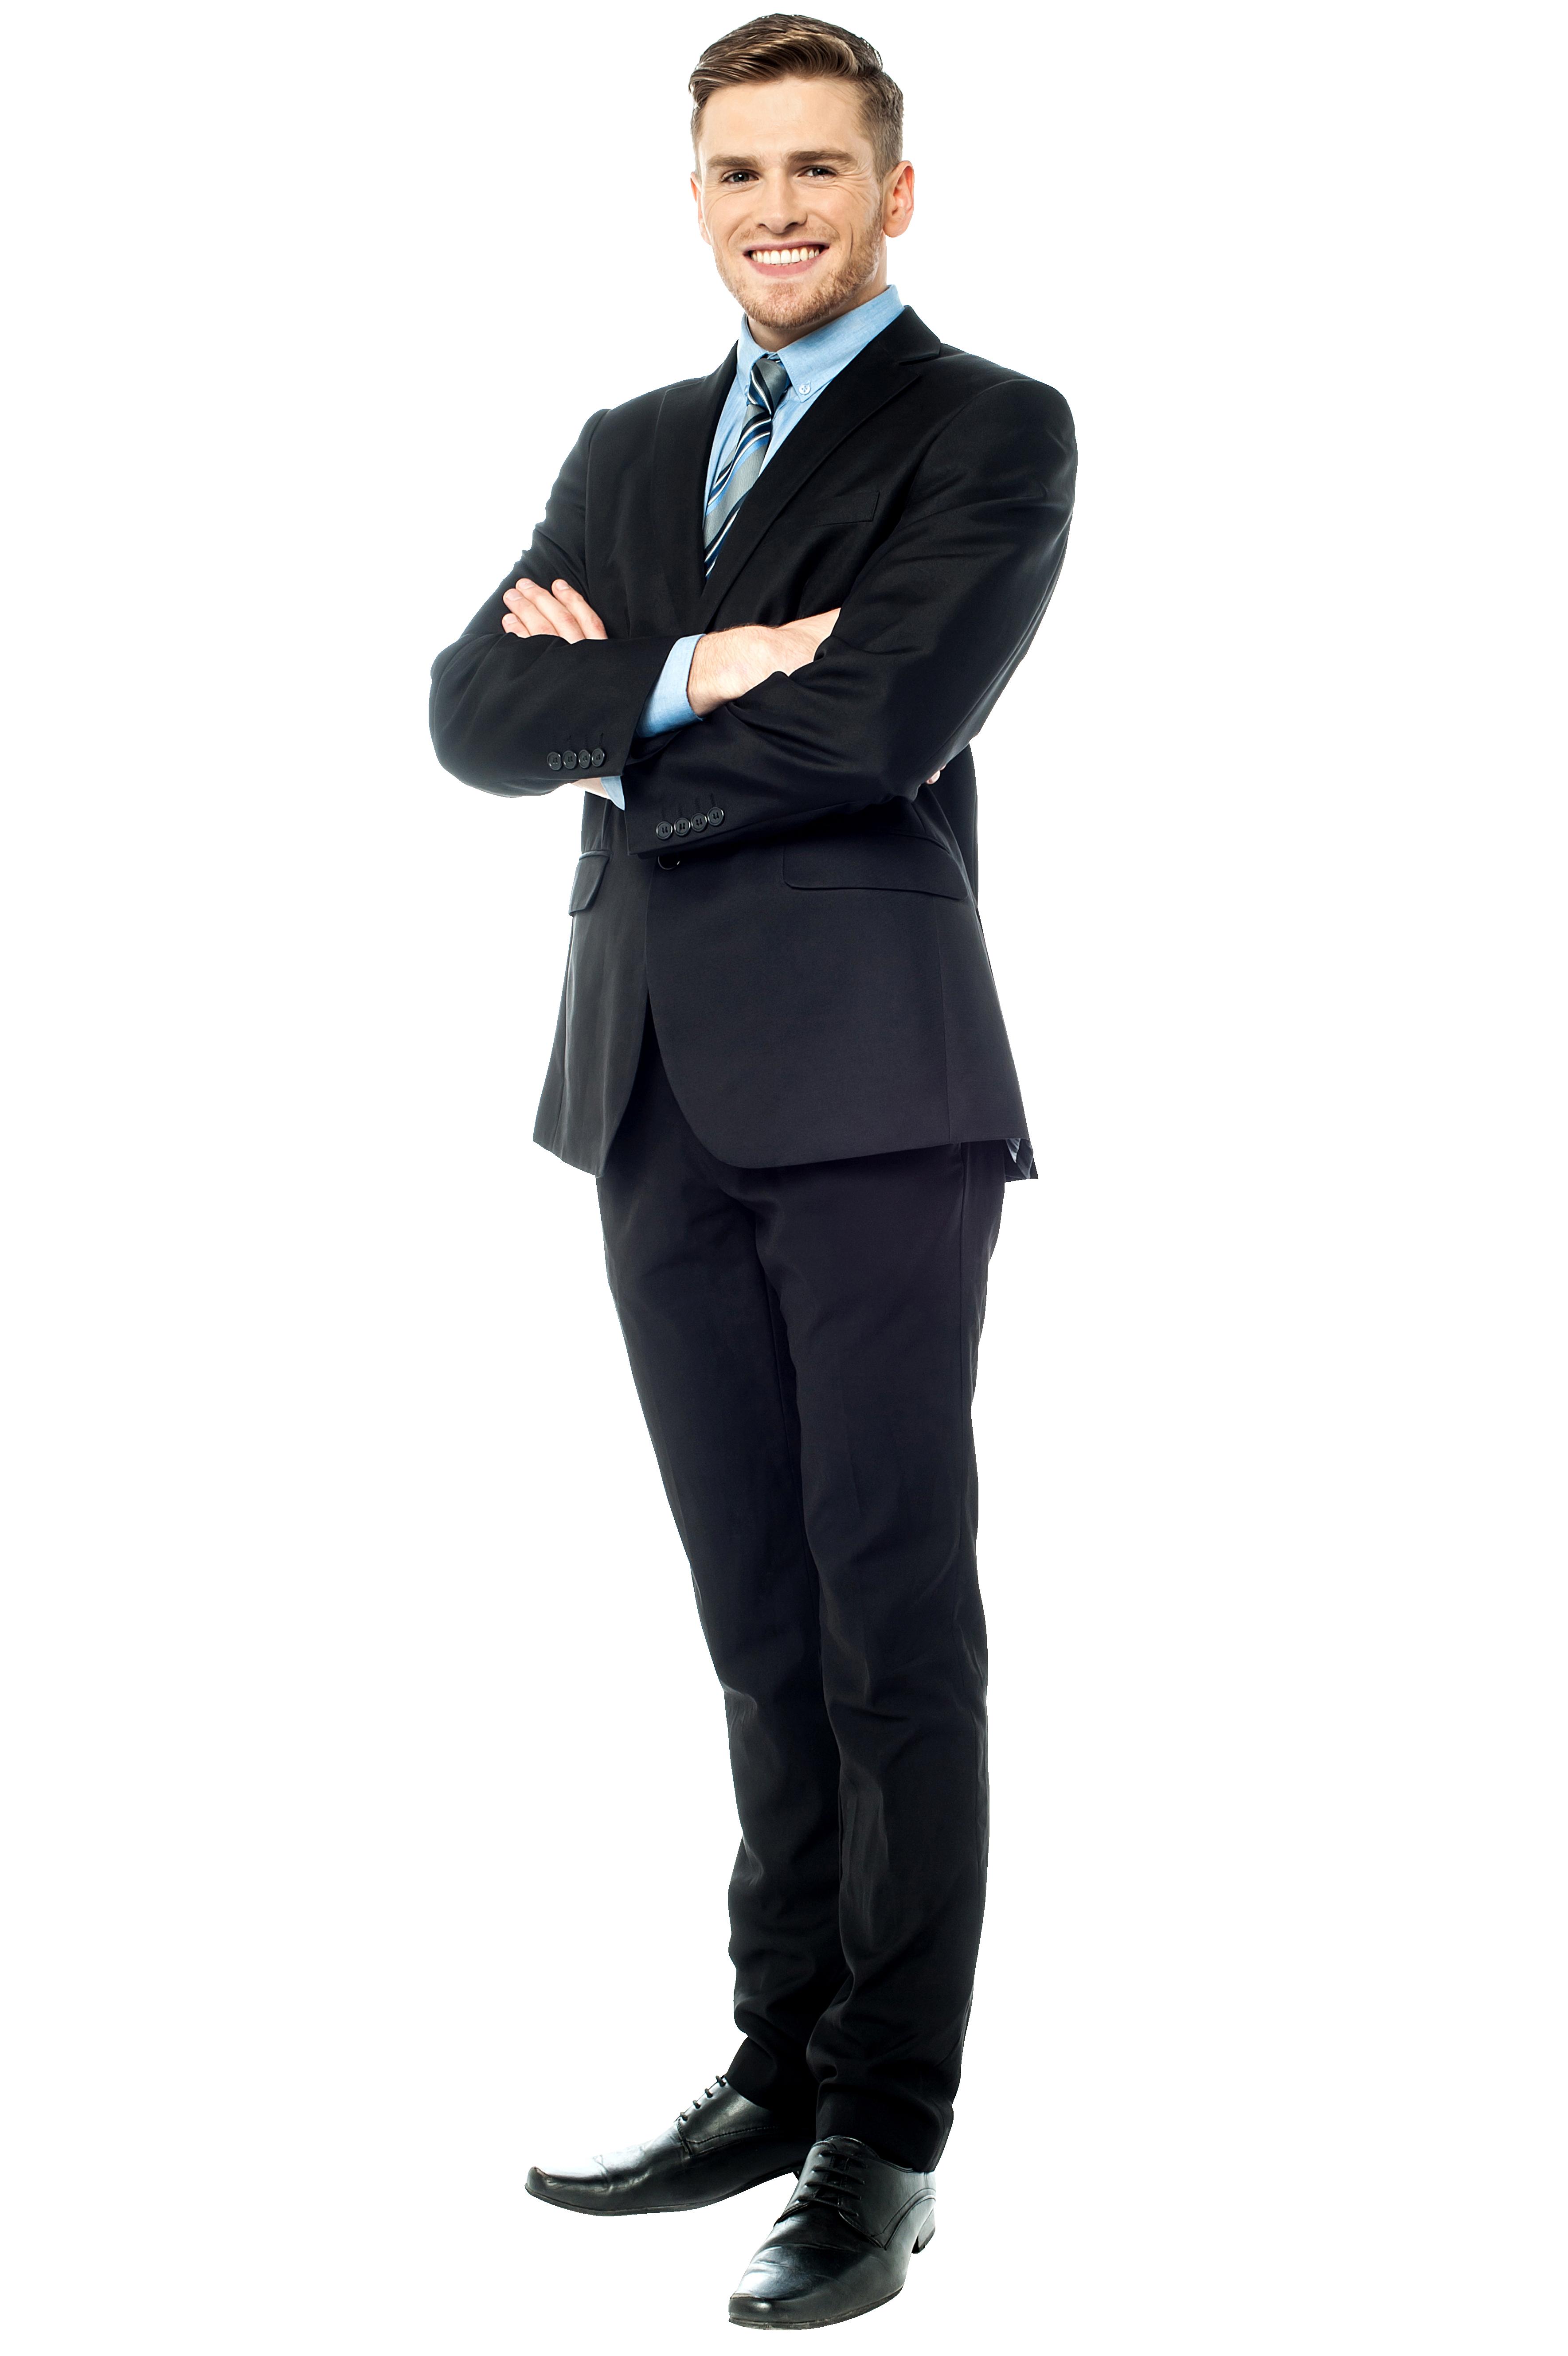 Men In Suit PNG Image - PurePNG | Free transparent CC0 PNG ...